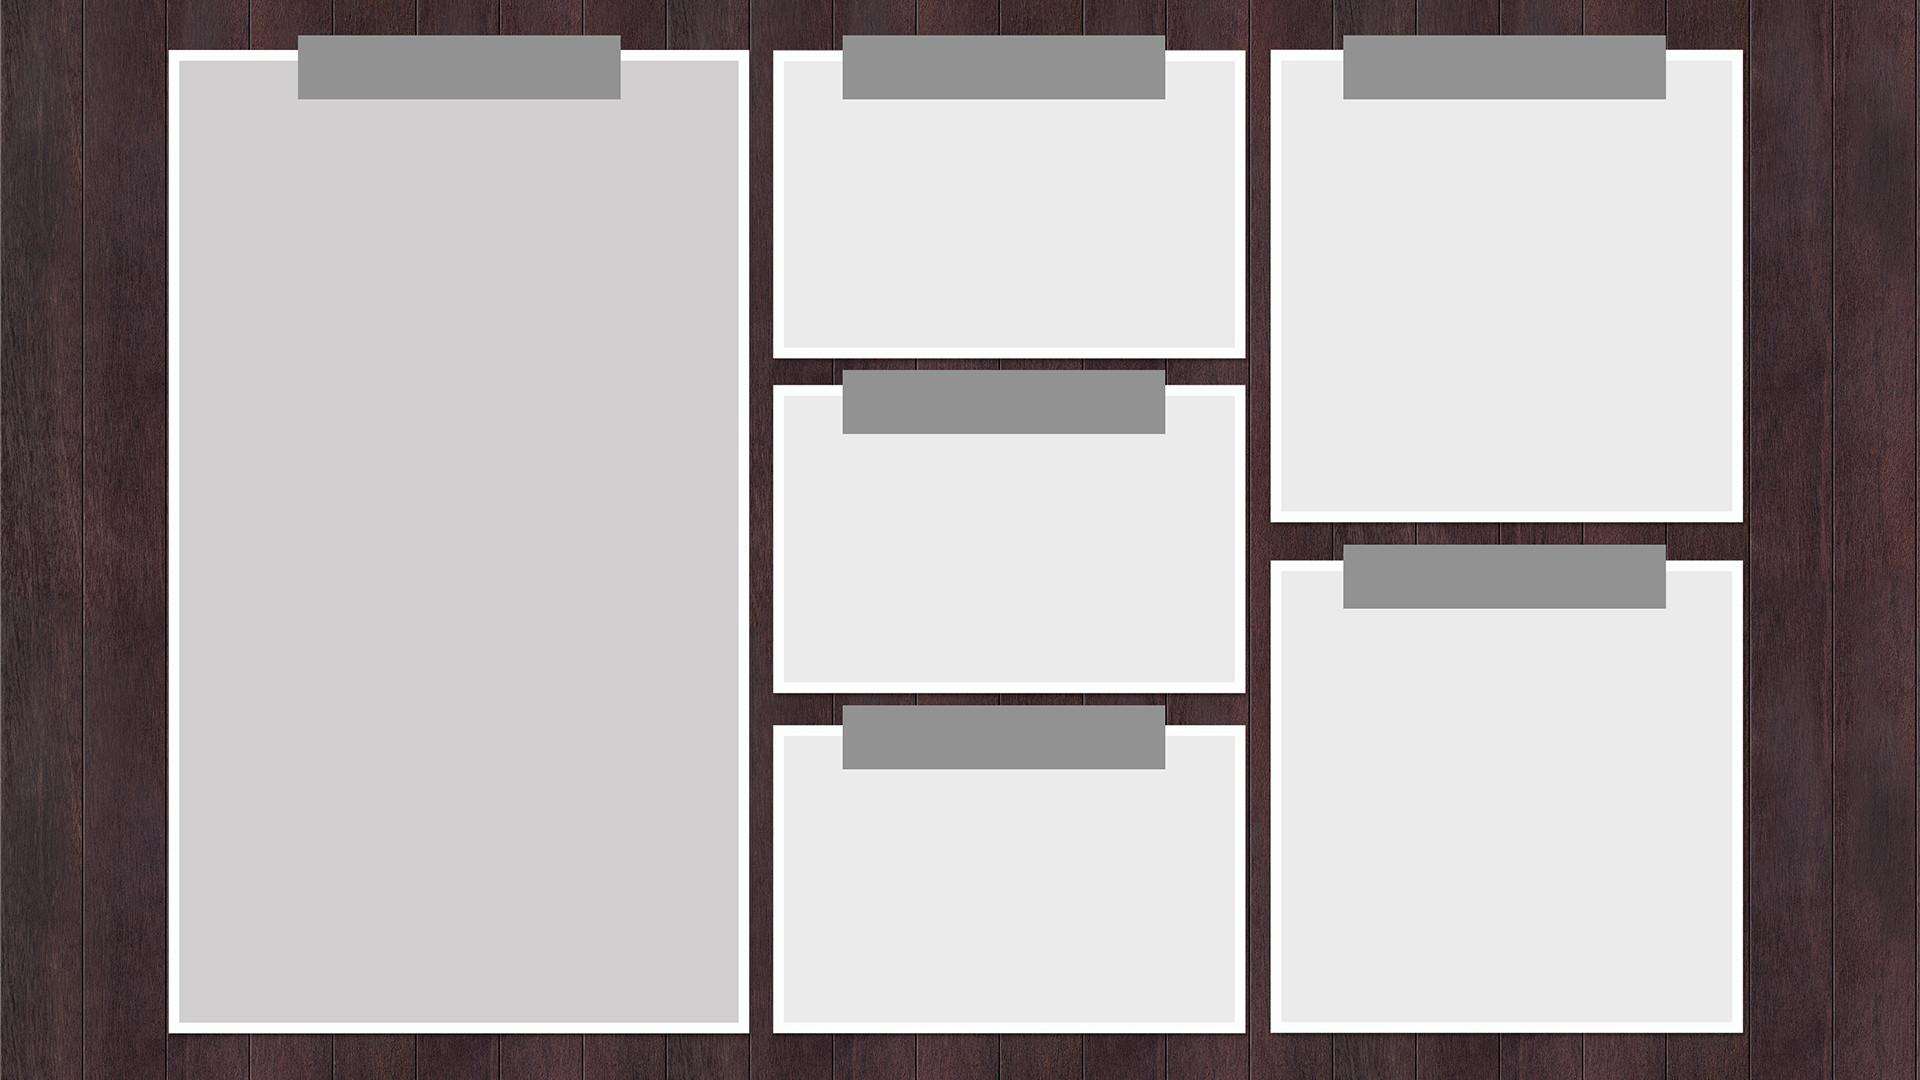 … desktop wallpaper icon organizer wallpapersafari; technology desktop  organization for men moritzfineblogdesigns com …